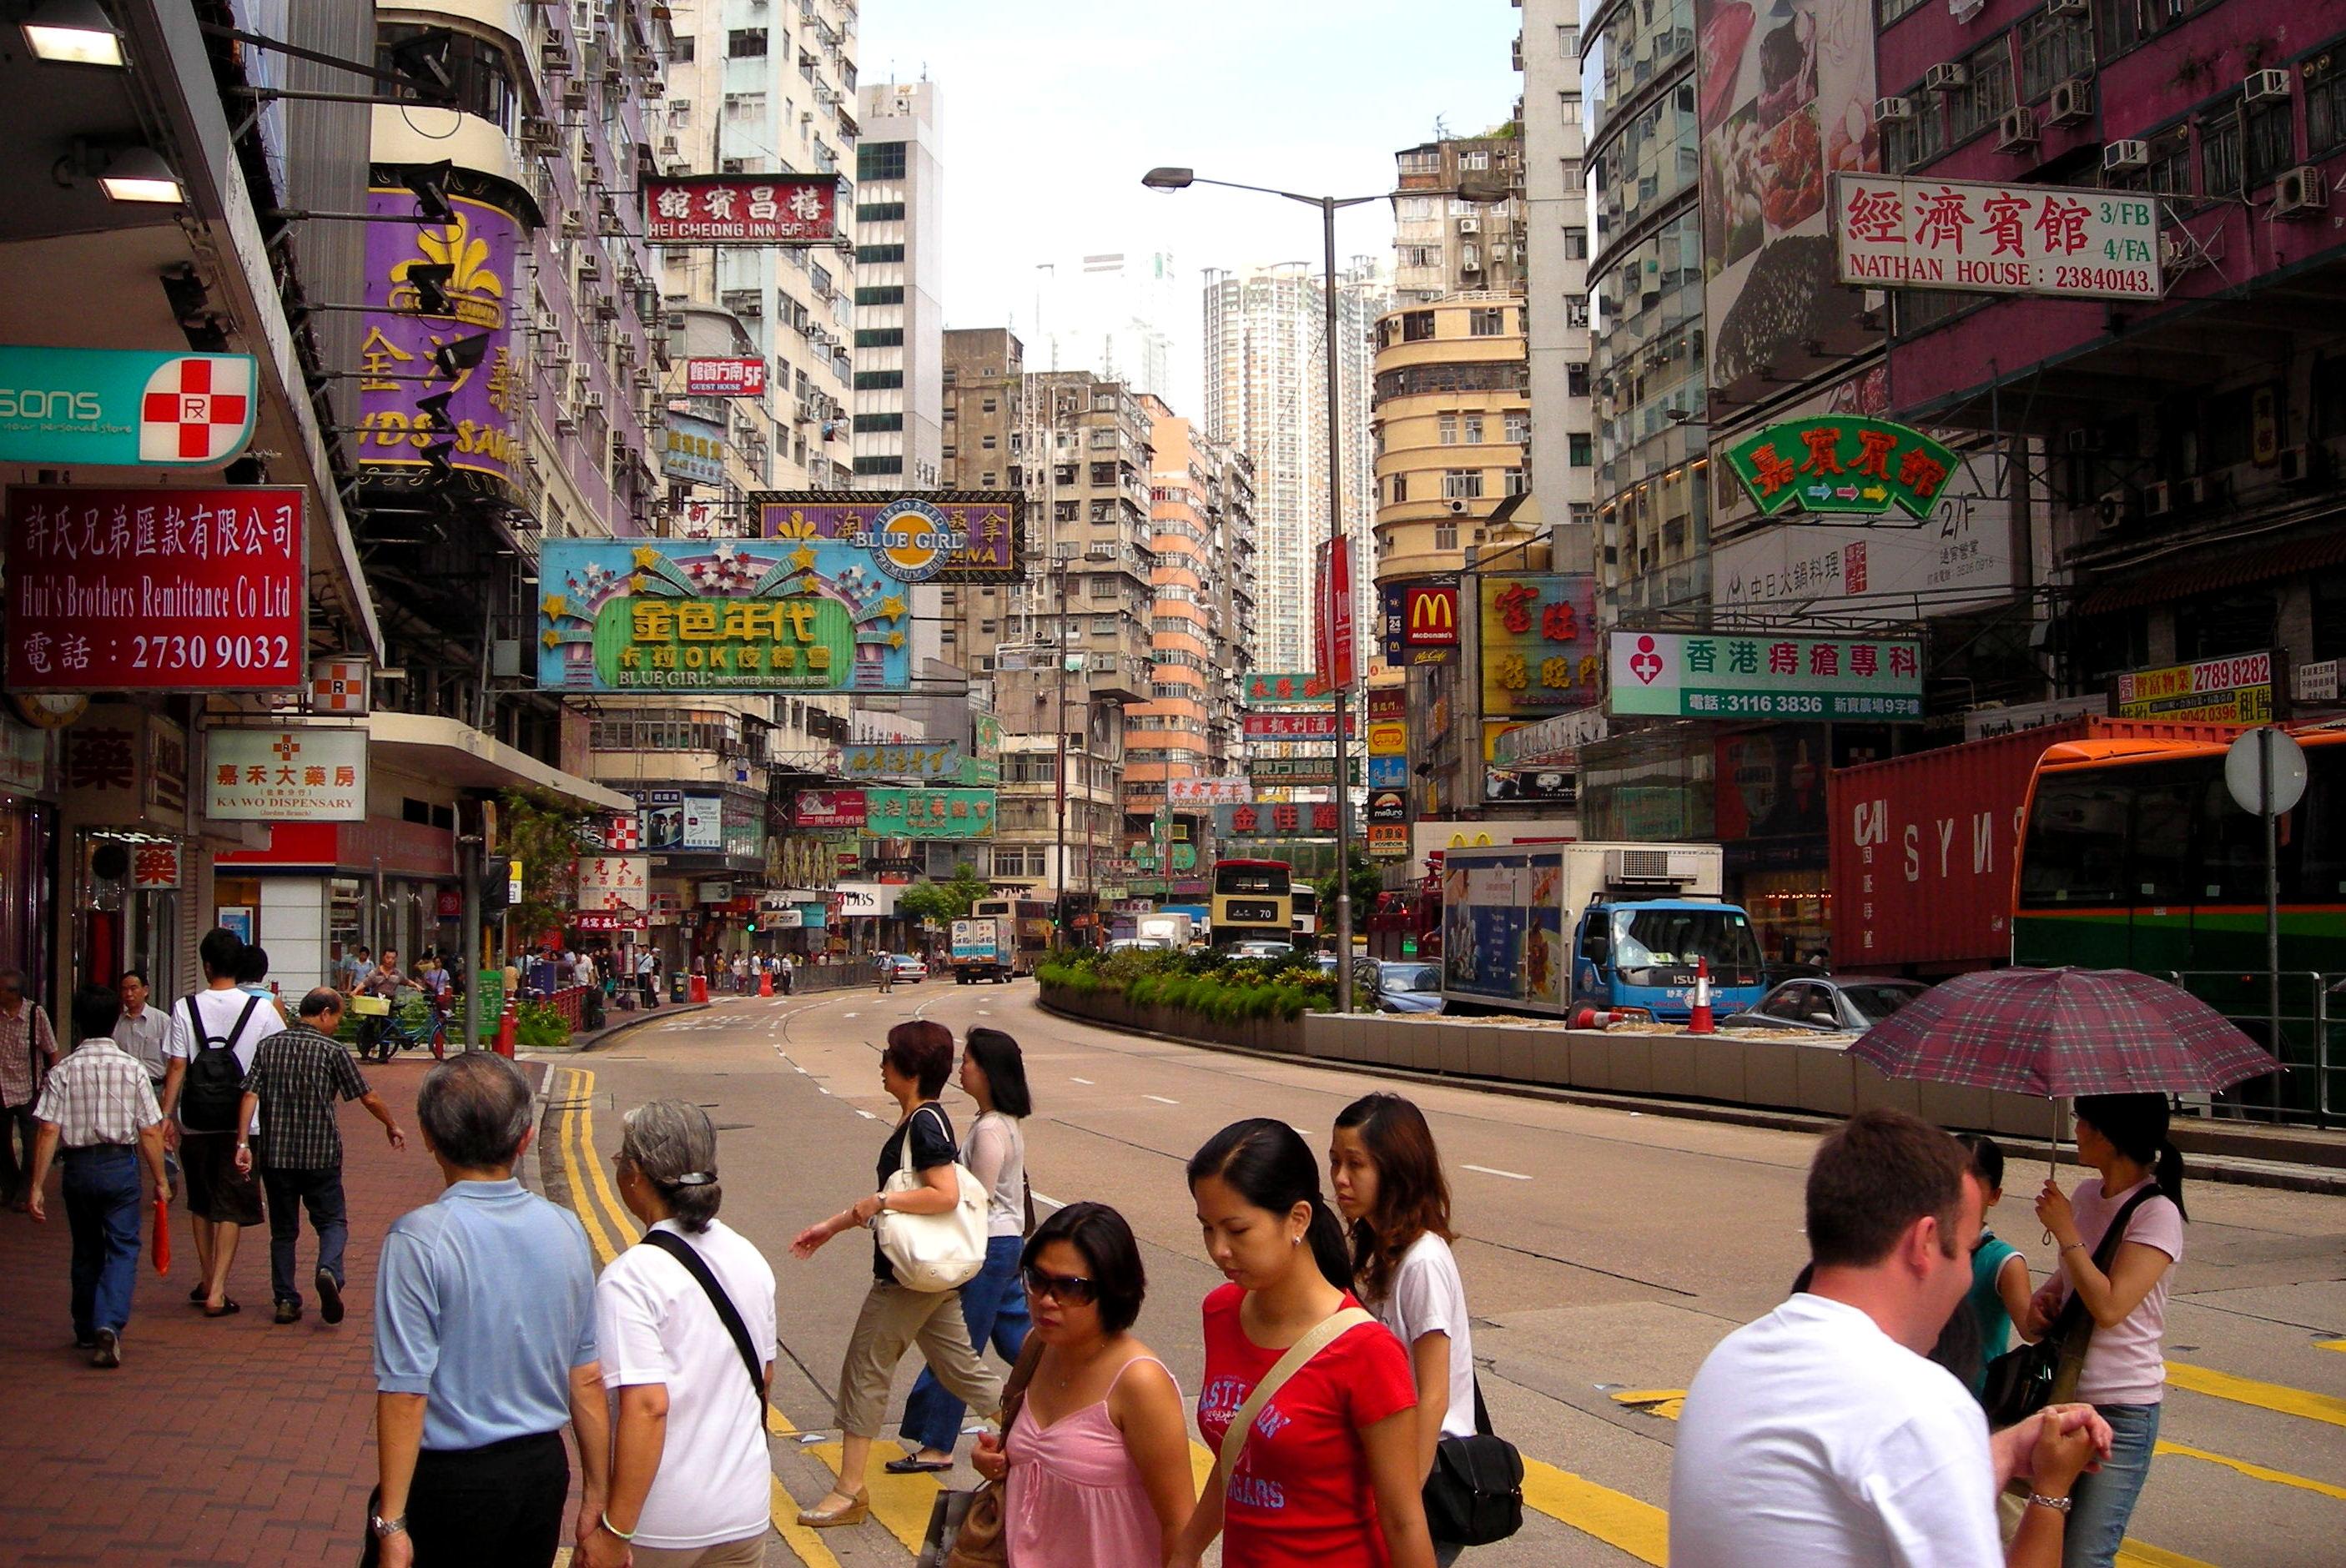 Things to do in Hong Kong – Top Attractions & Activities |Hong Kong Street